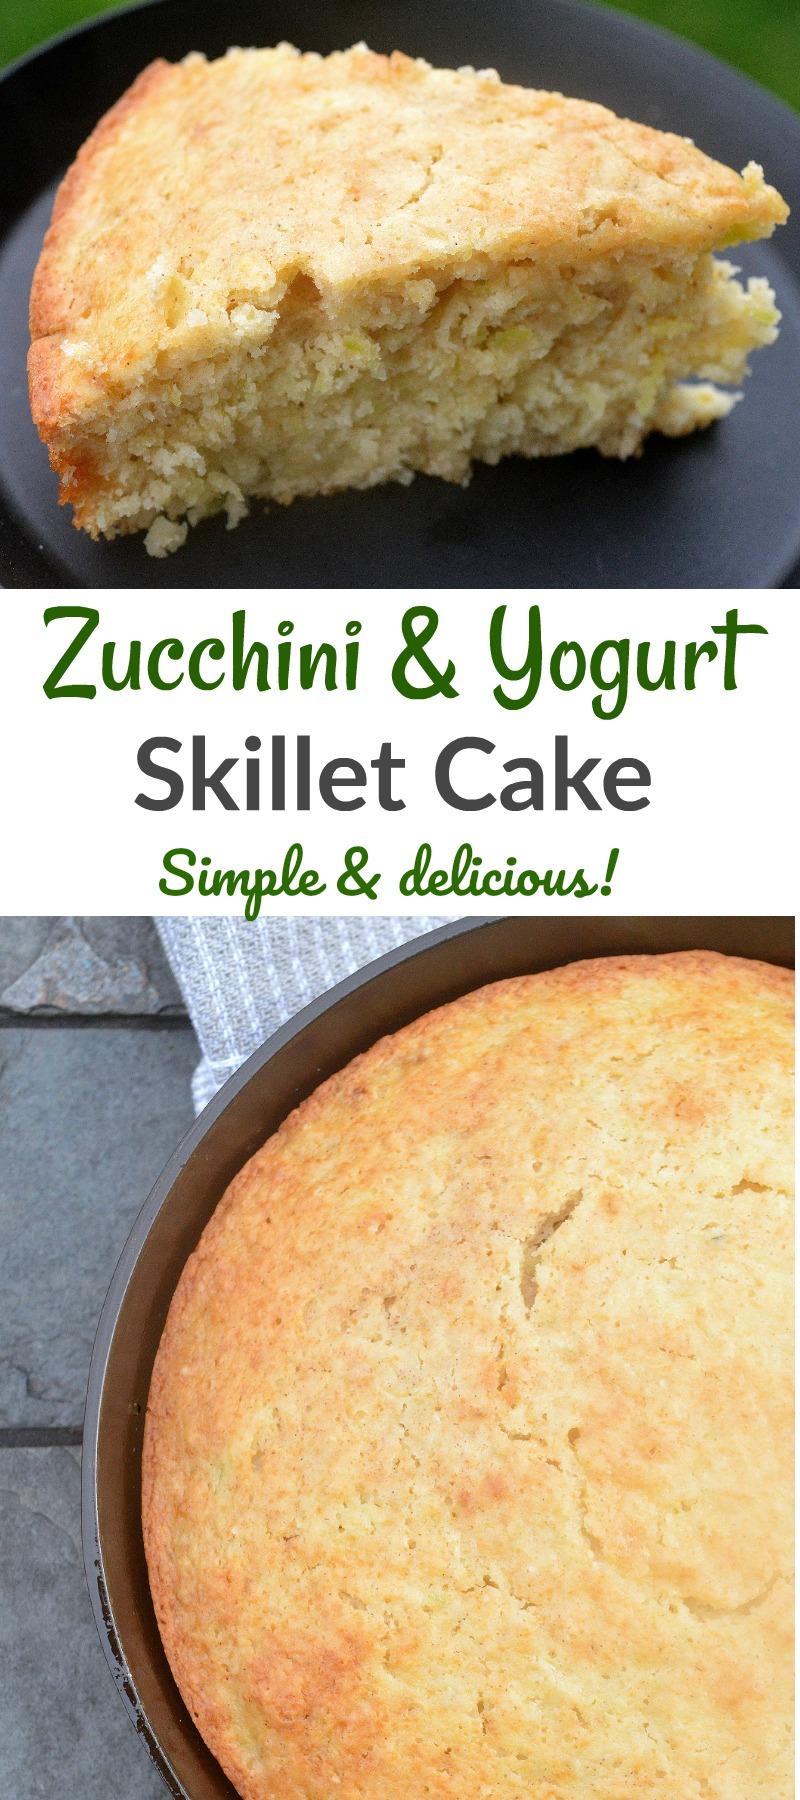 Zucchini Yogurt Skillet Cake. Simple, moist & delicious!